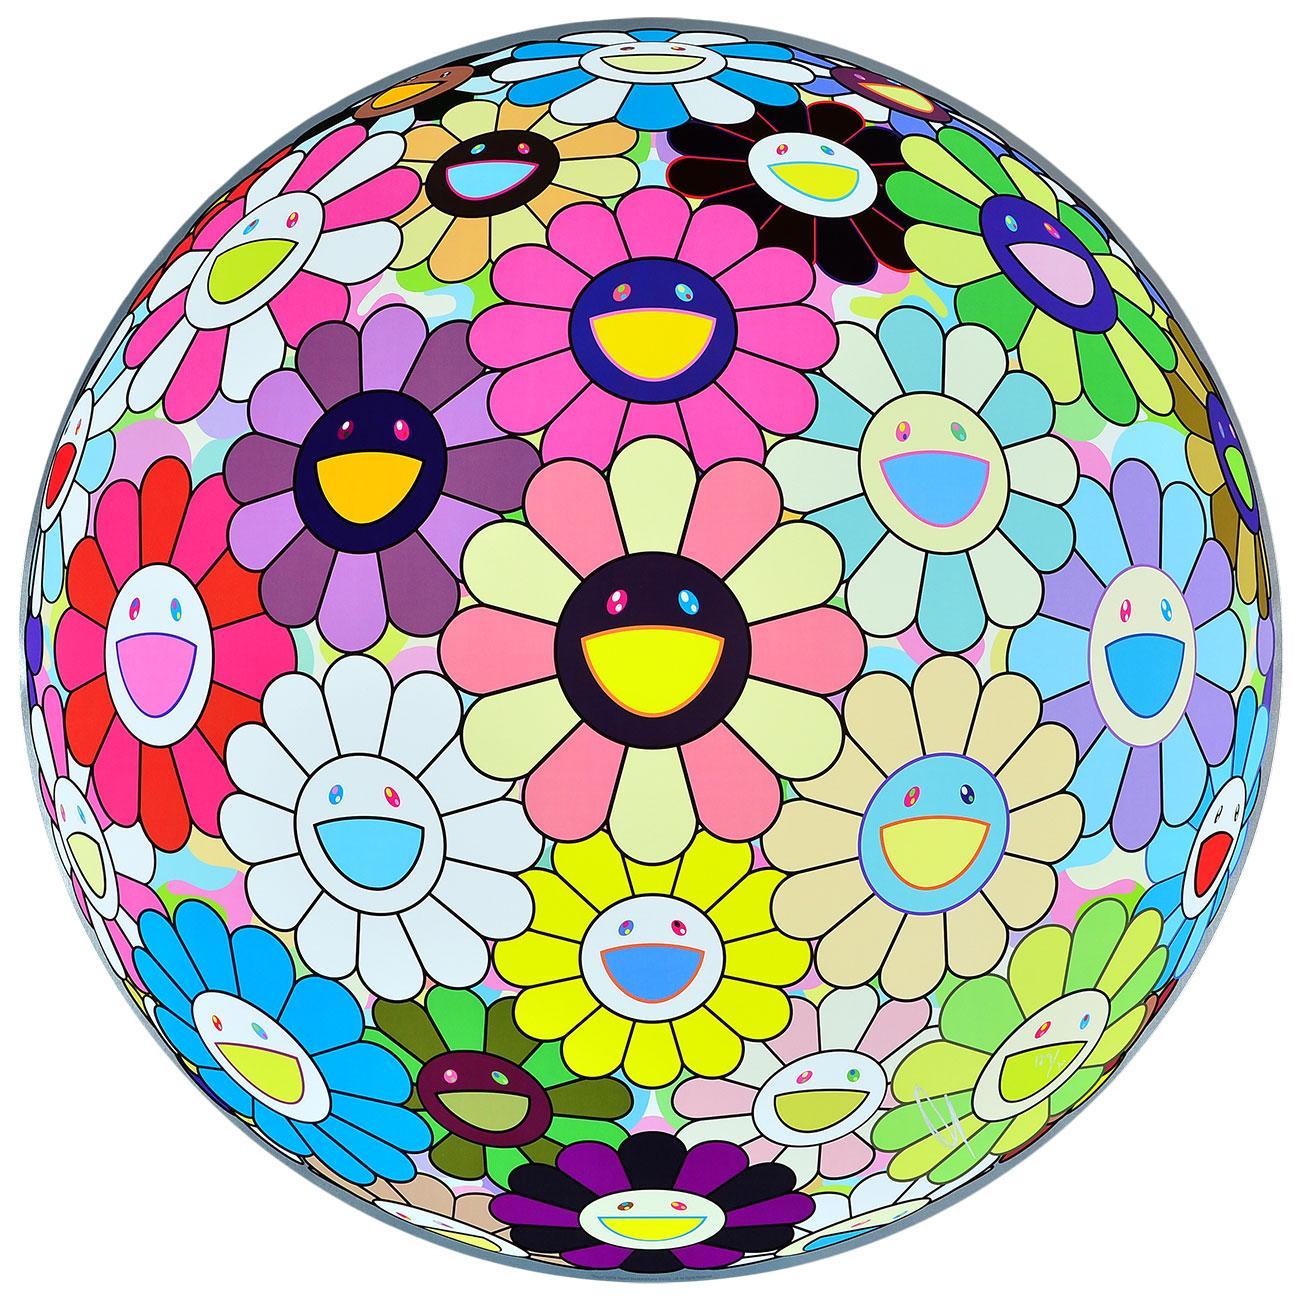 TAKASHI MURAKAMI: Flower Ball Limited ed. hand signed & numb. Superflat, Pop Art